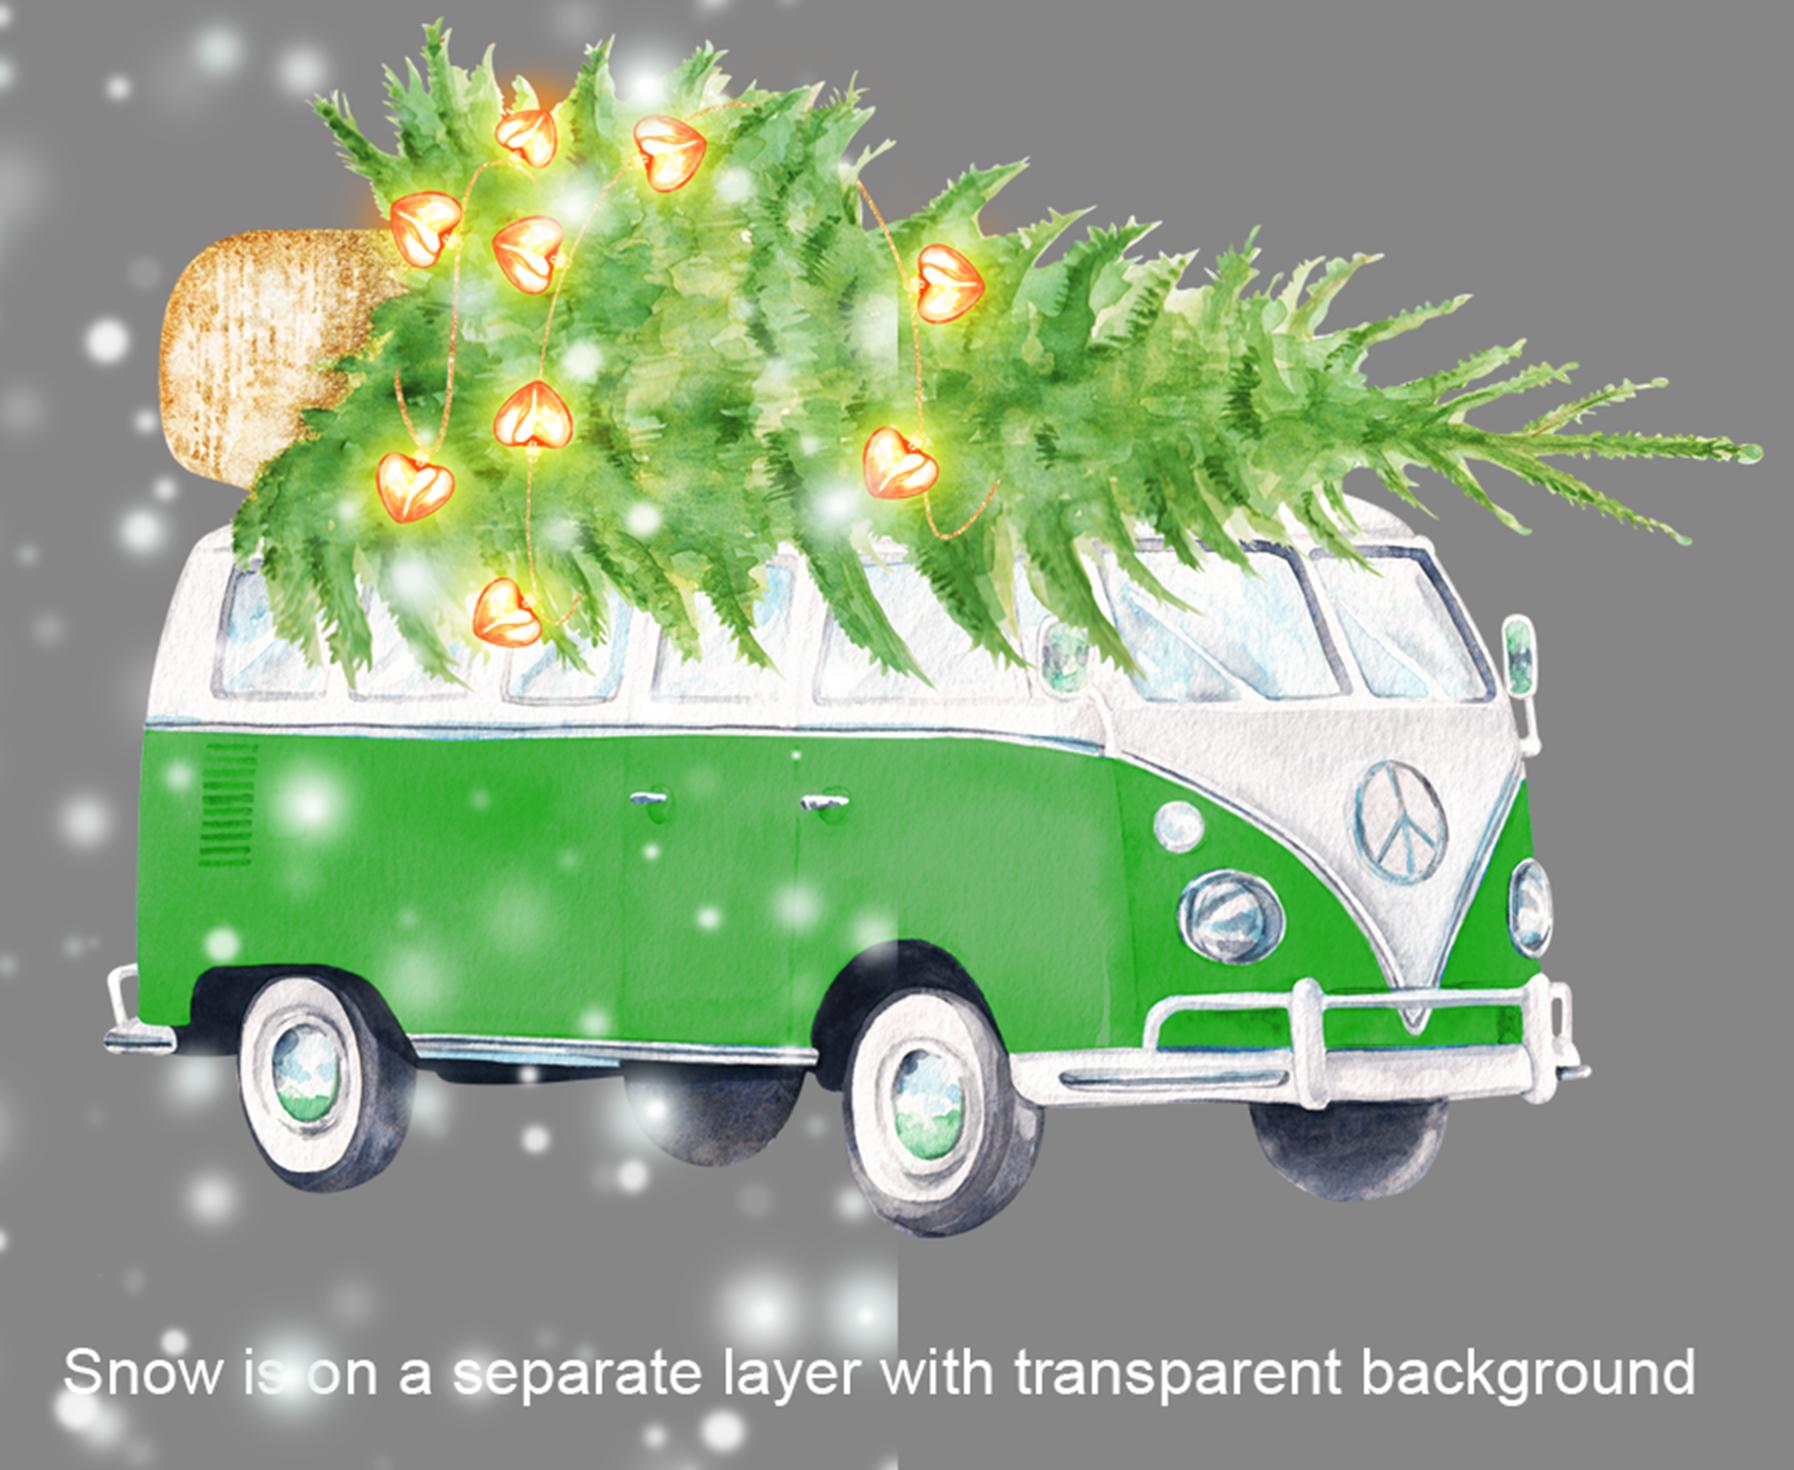 Watercolor Christmas retro van clipart example image 4